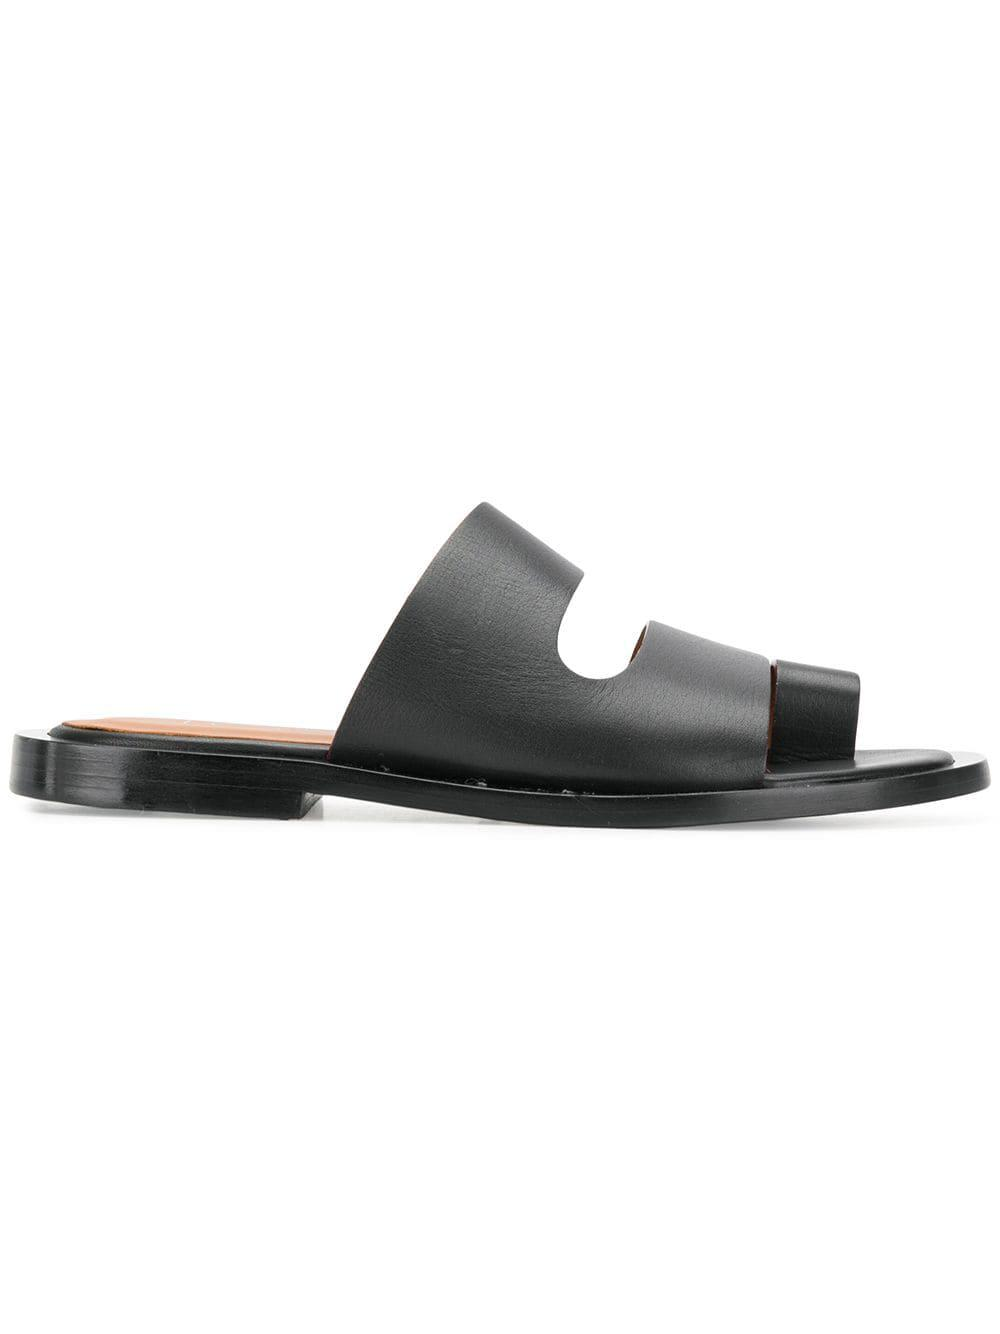 finest selection a2b04 7e33a joseph-Black-Toe-strap-Flat-Sandals.jpeg